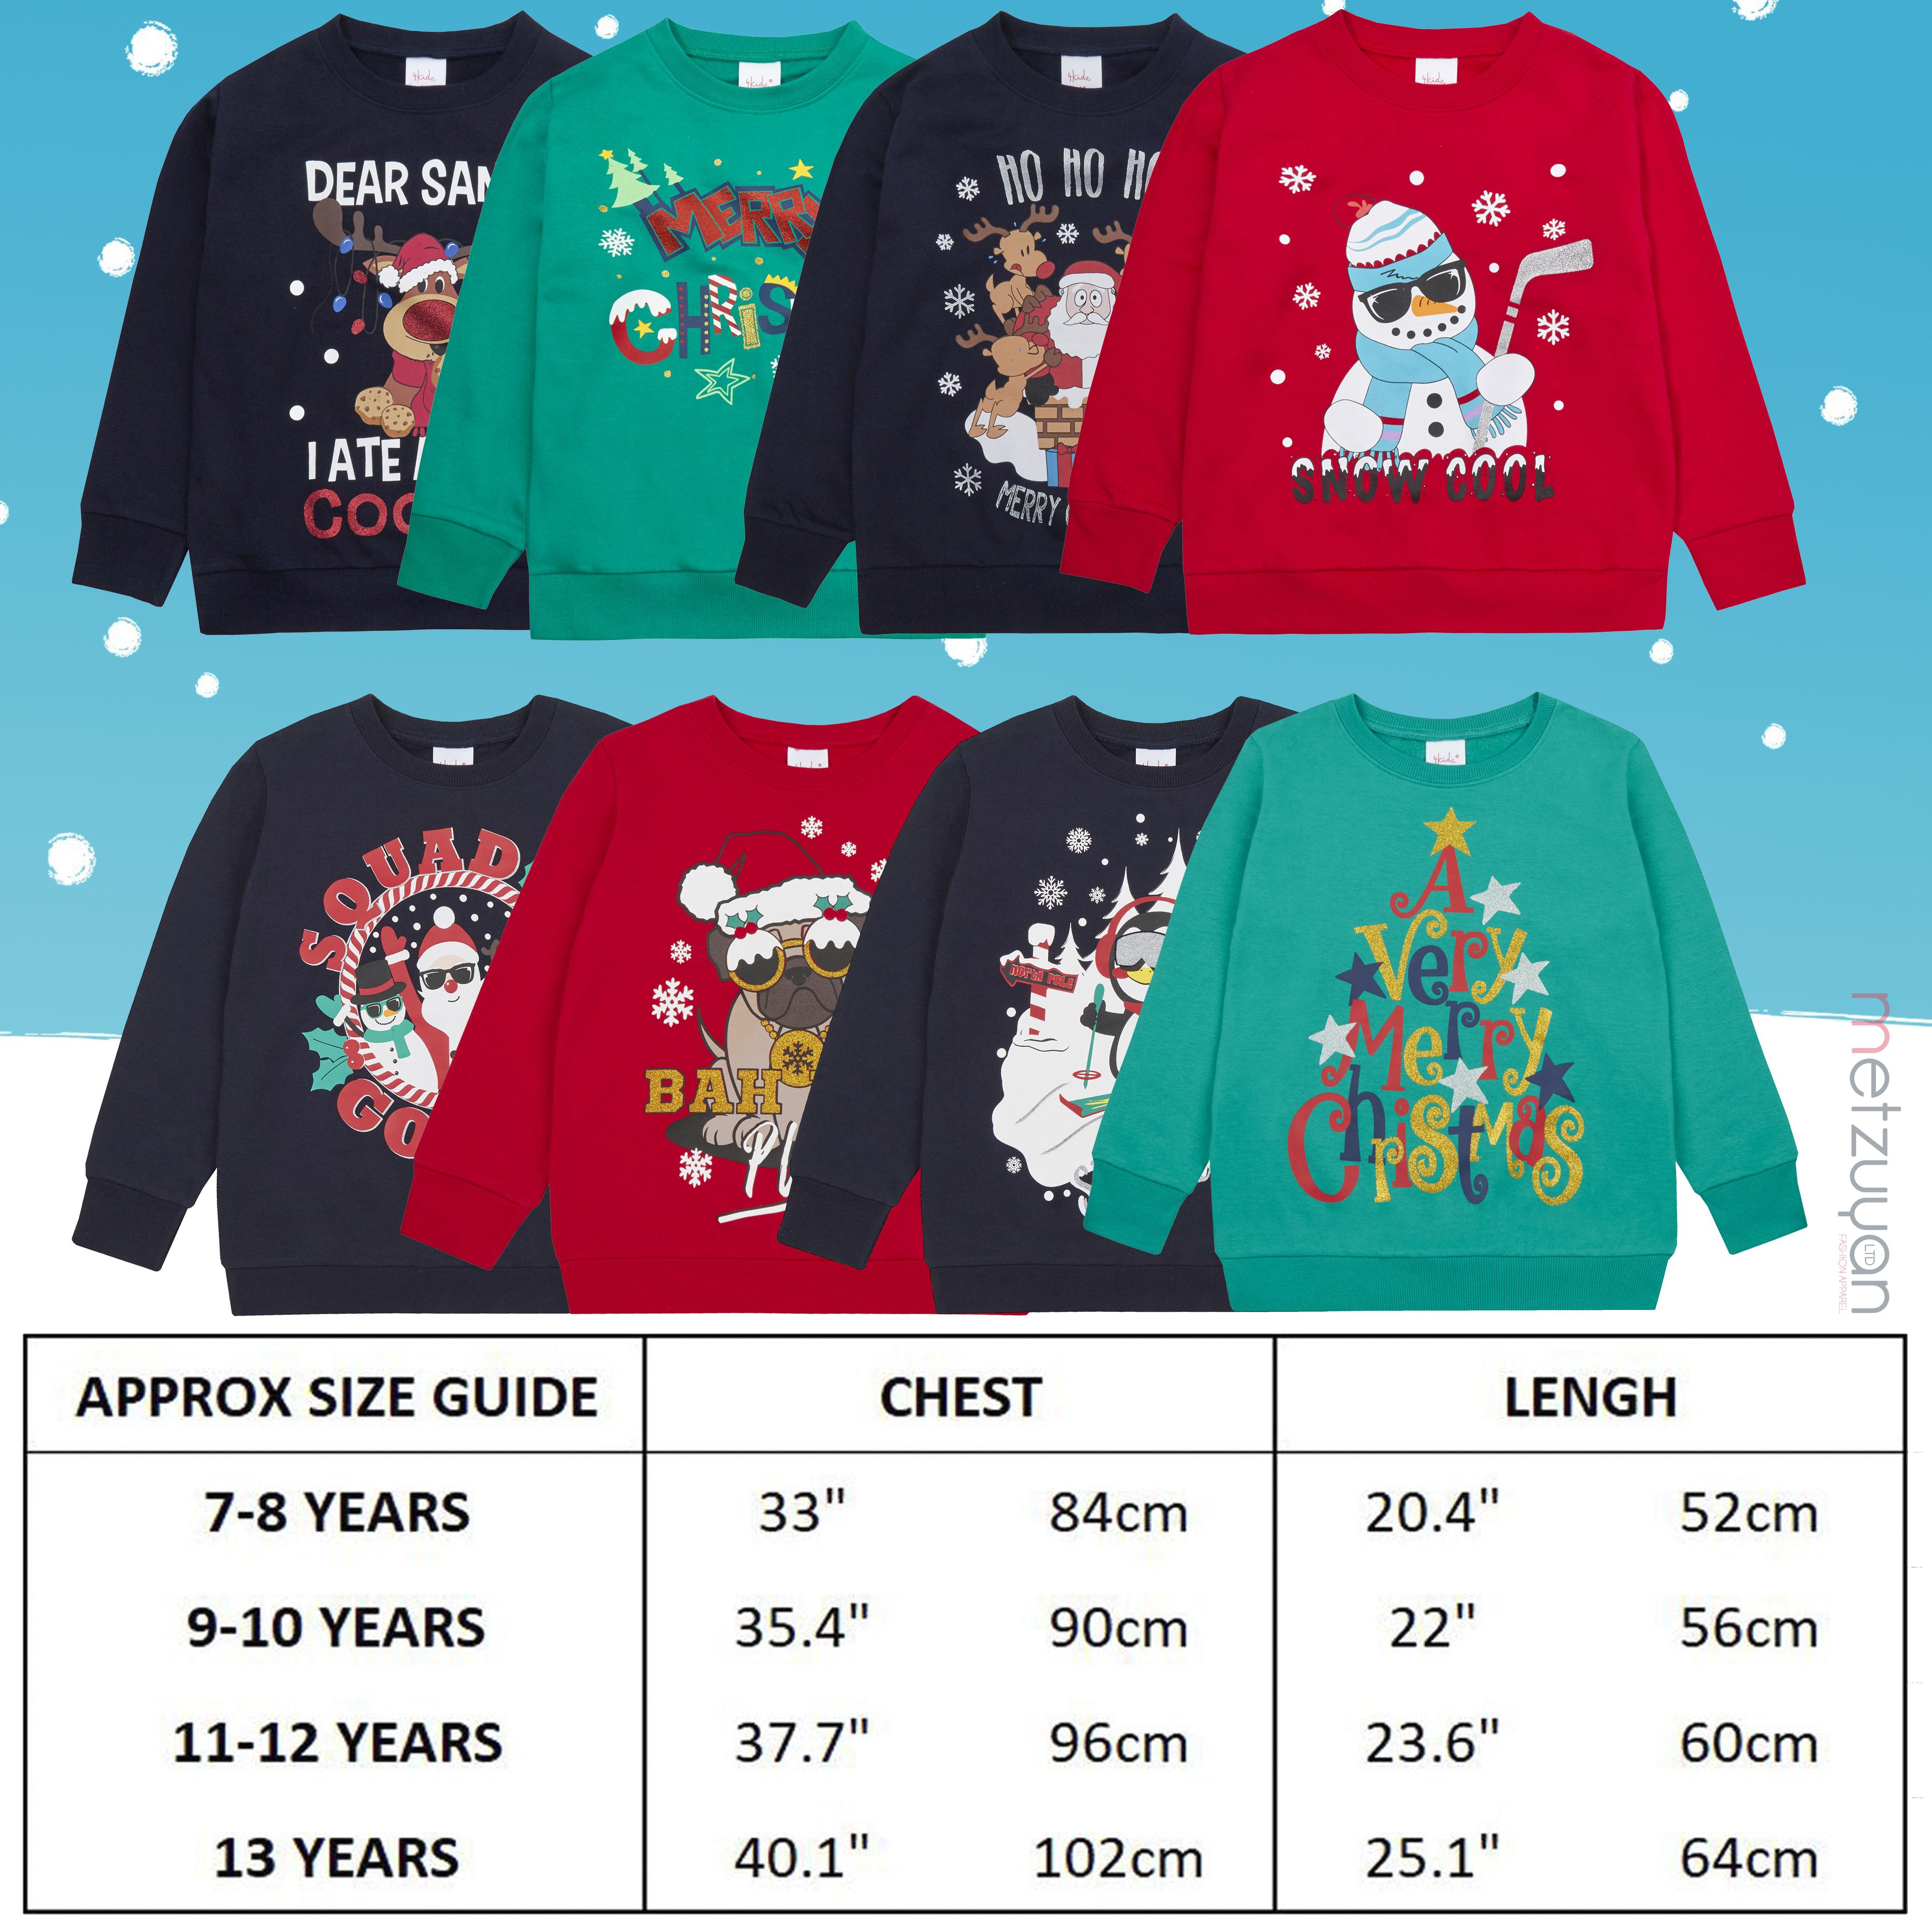 Enfants-Garcons-Filles-Noel-Noel-Pull-Sweat-shirt-Carlin-Glitter-chaud miniature 17